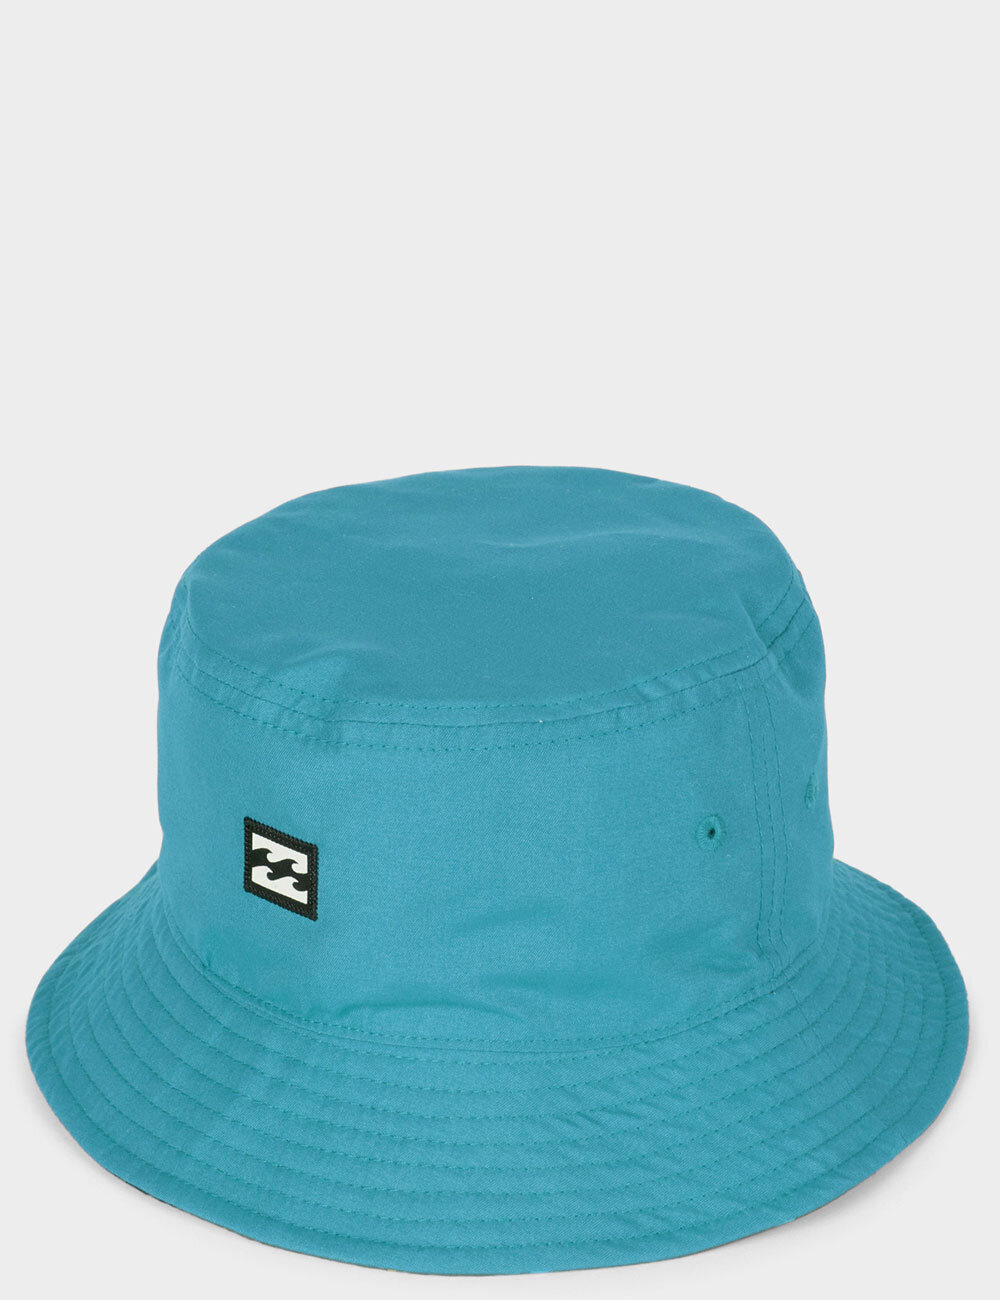 Groms Revo Bucket Hat Boy S Clothing Surf Clothing Streetwear